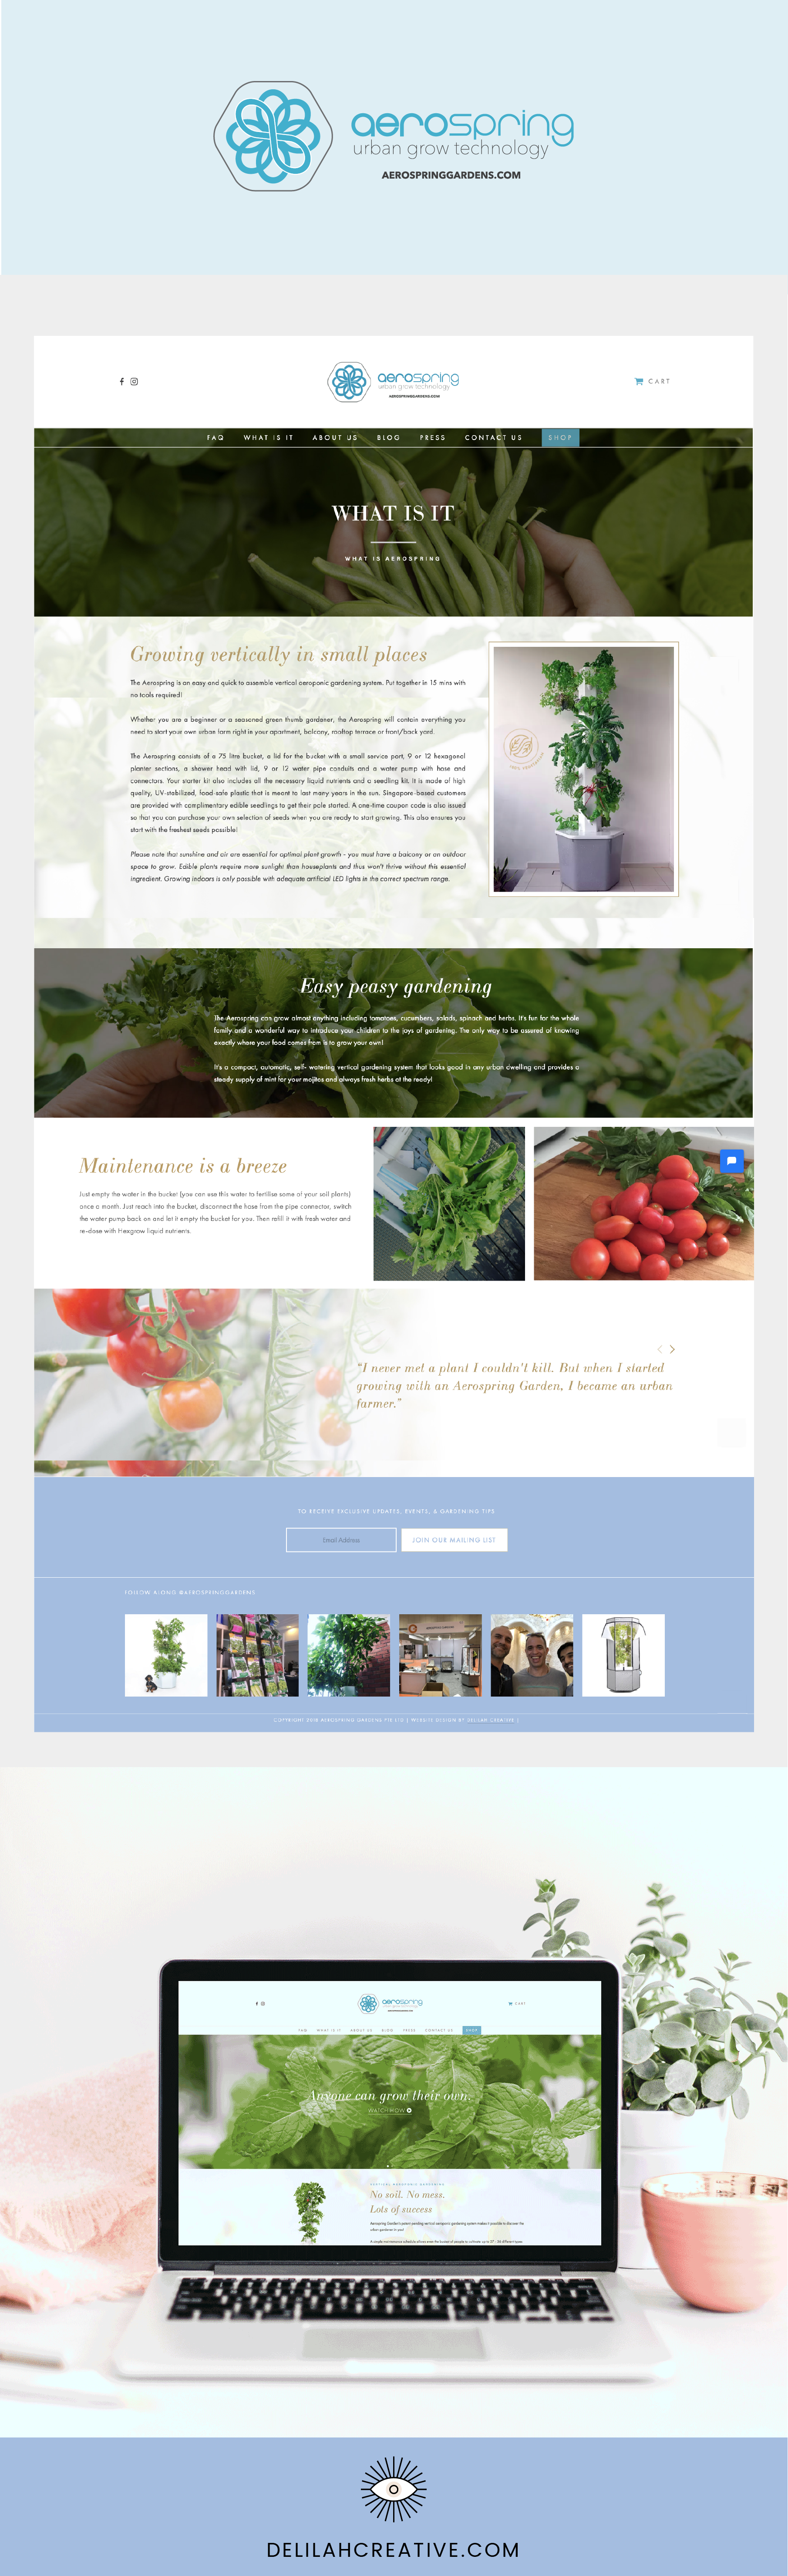 Aerospring-garden-ecommerce-website-design-singapore-delilah-creative